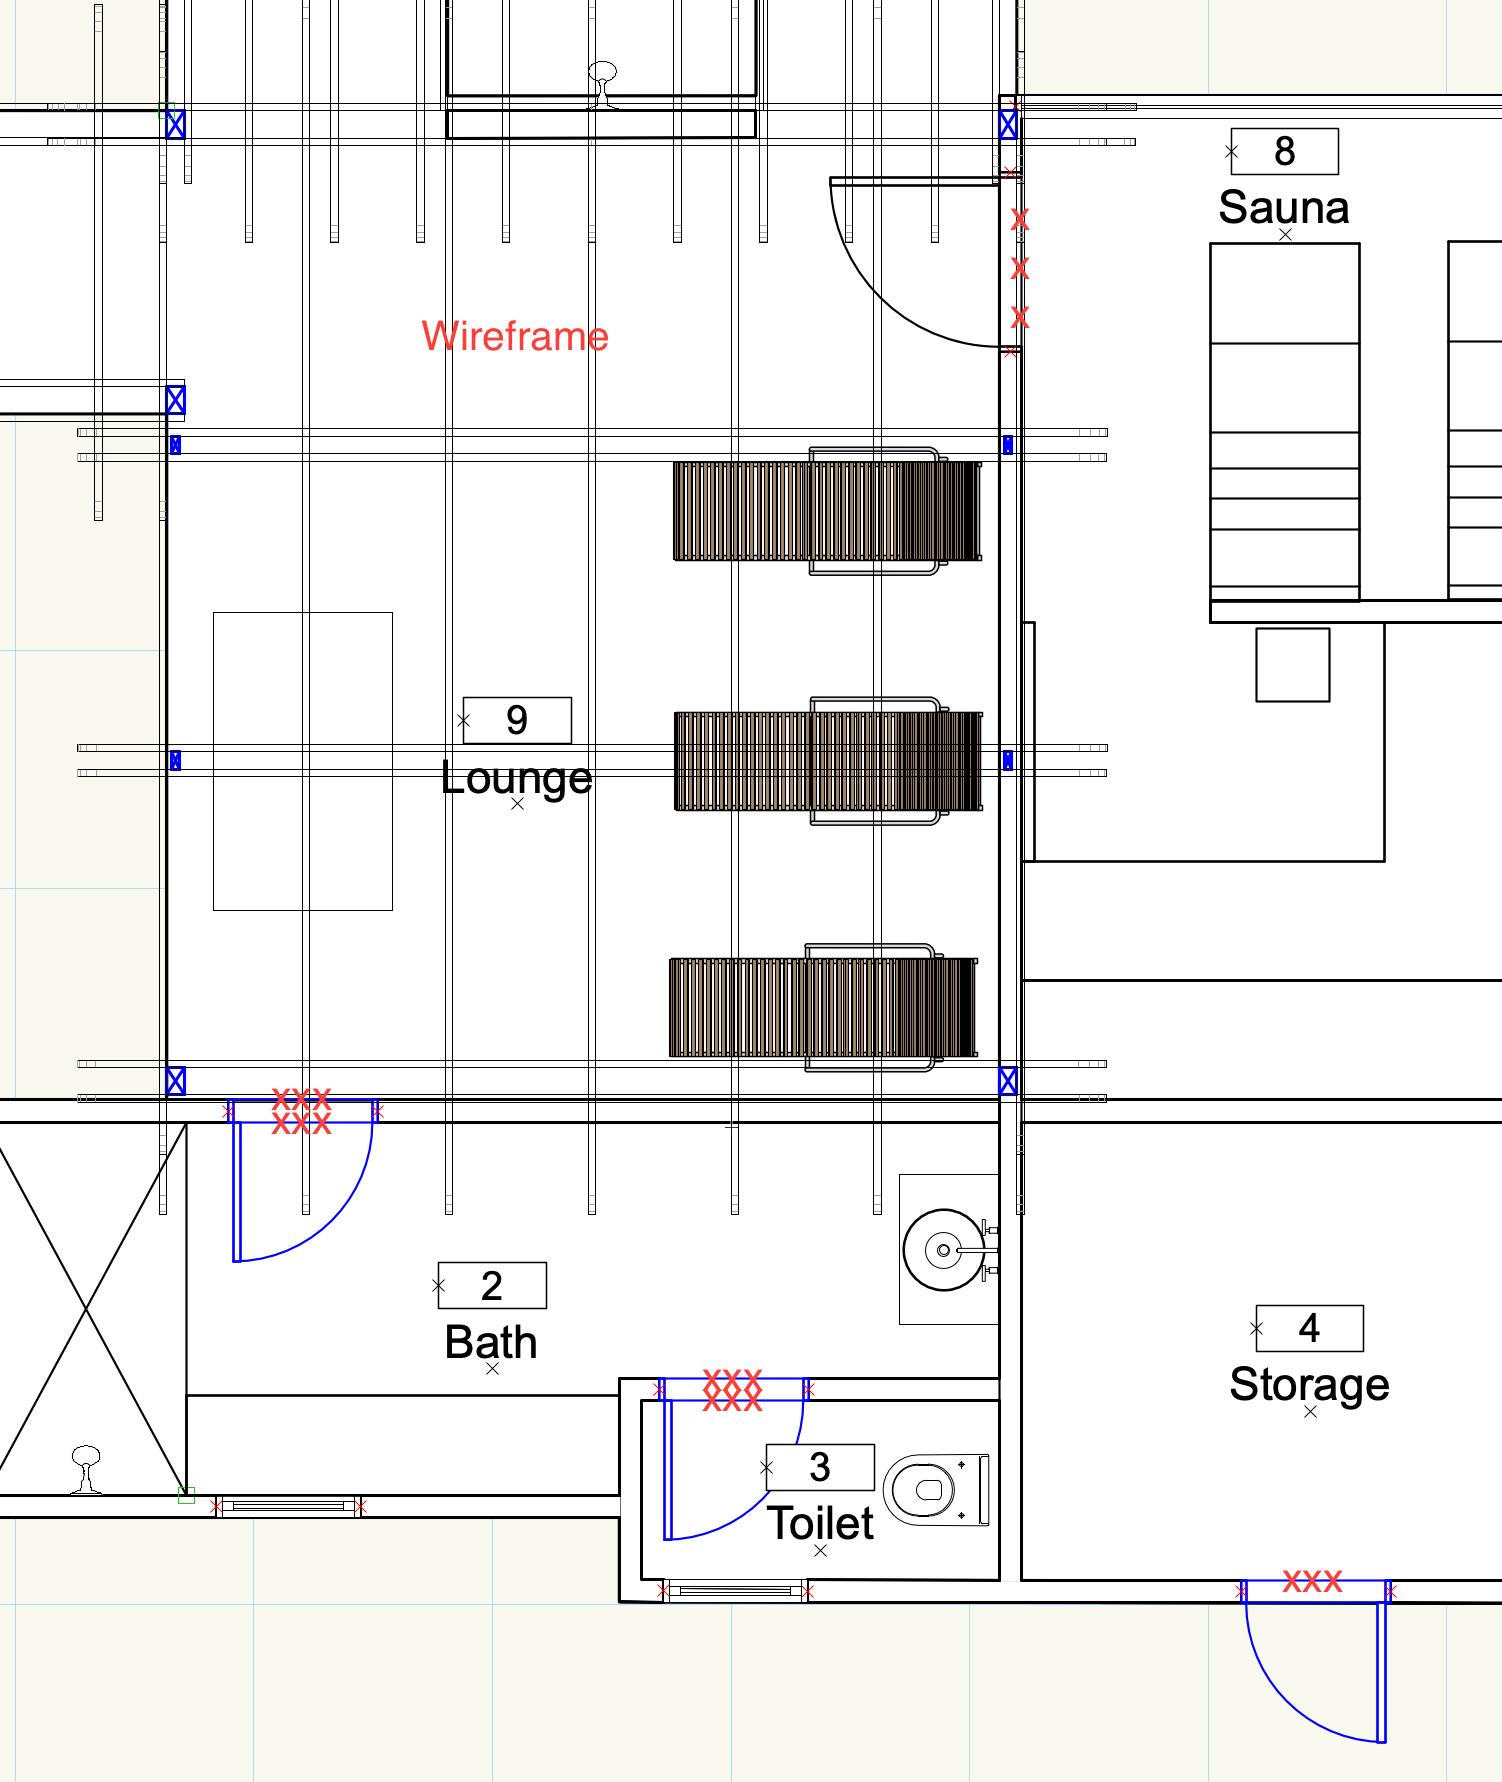 Floor Plan Cut Plane - Architecture